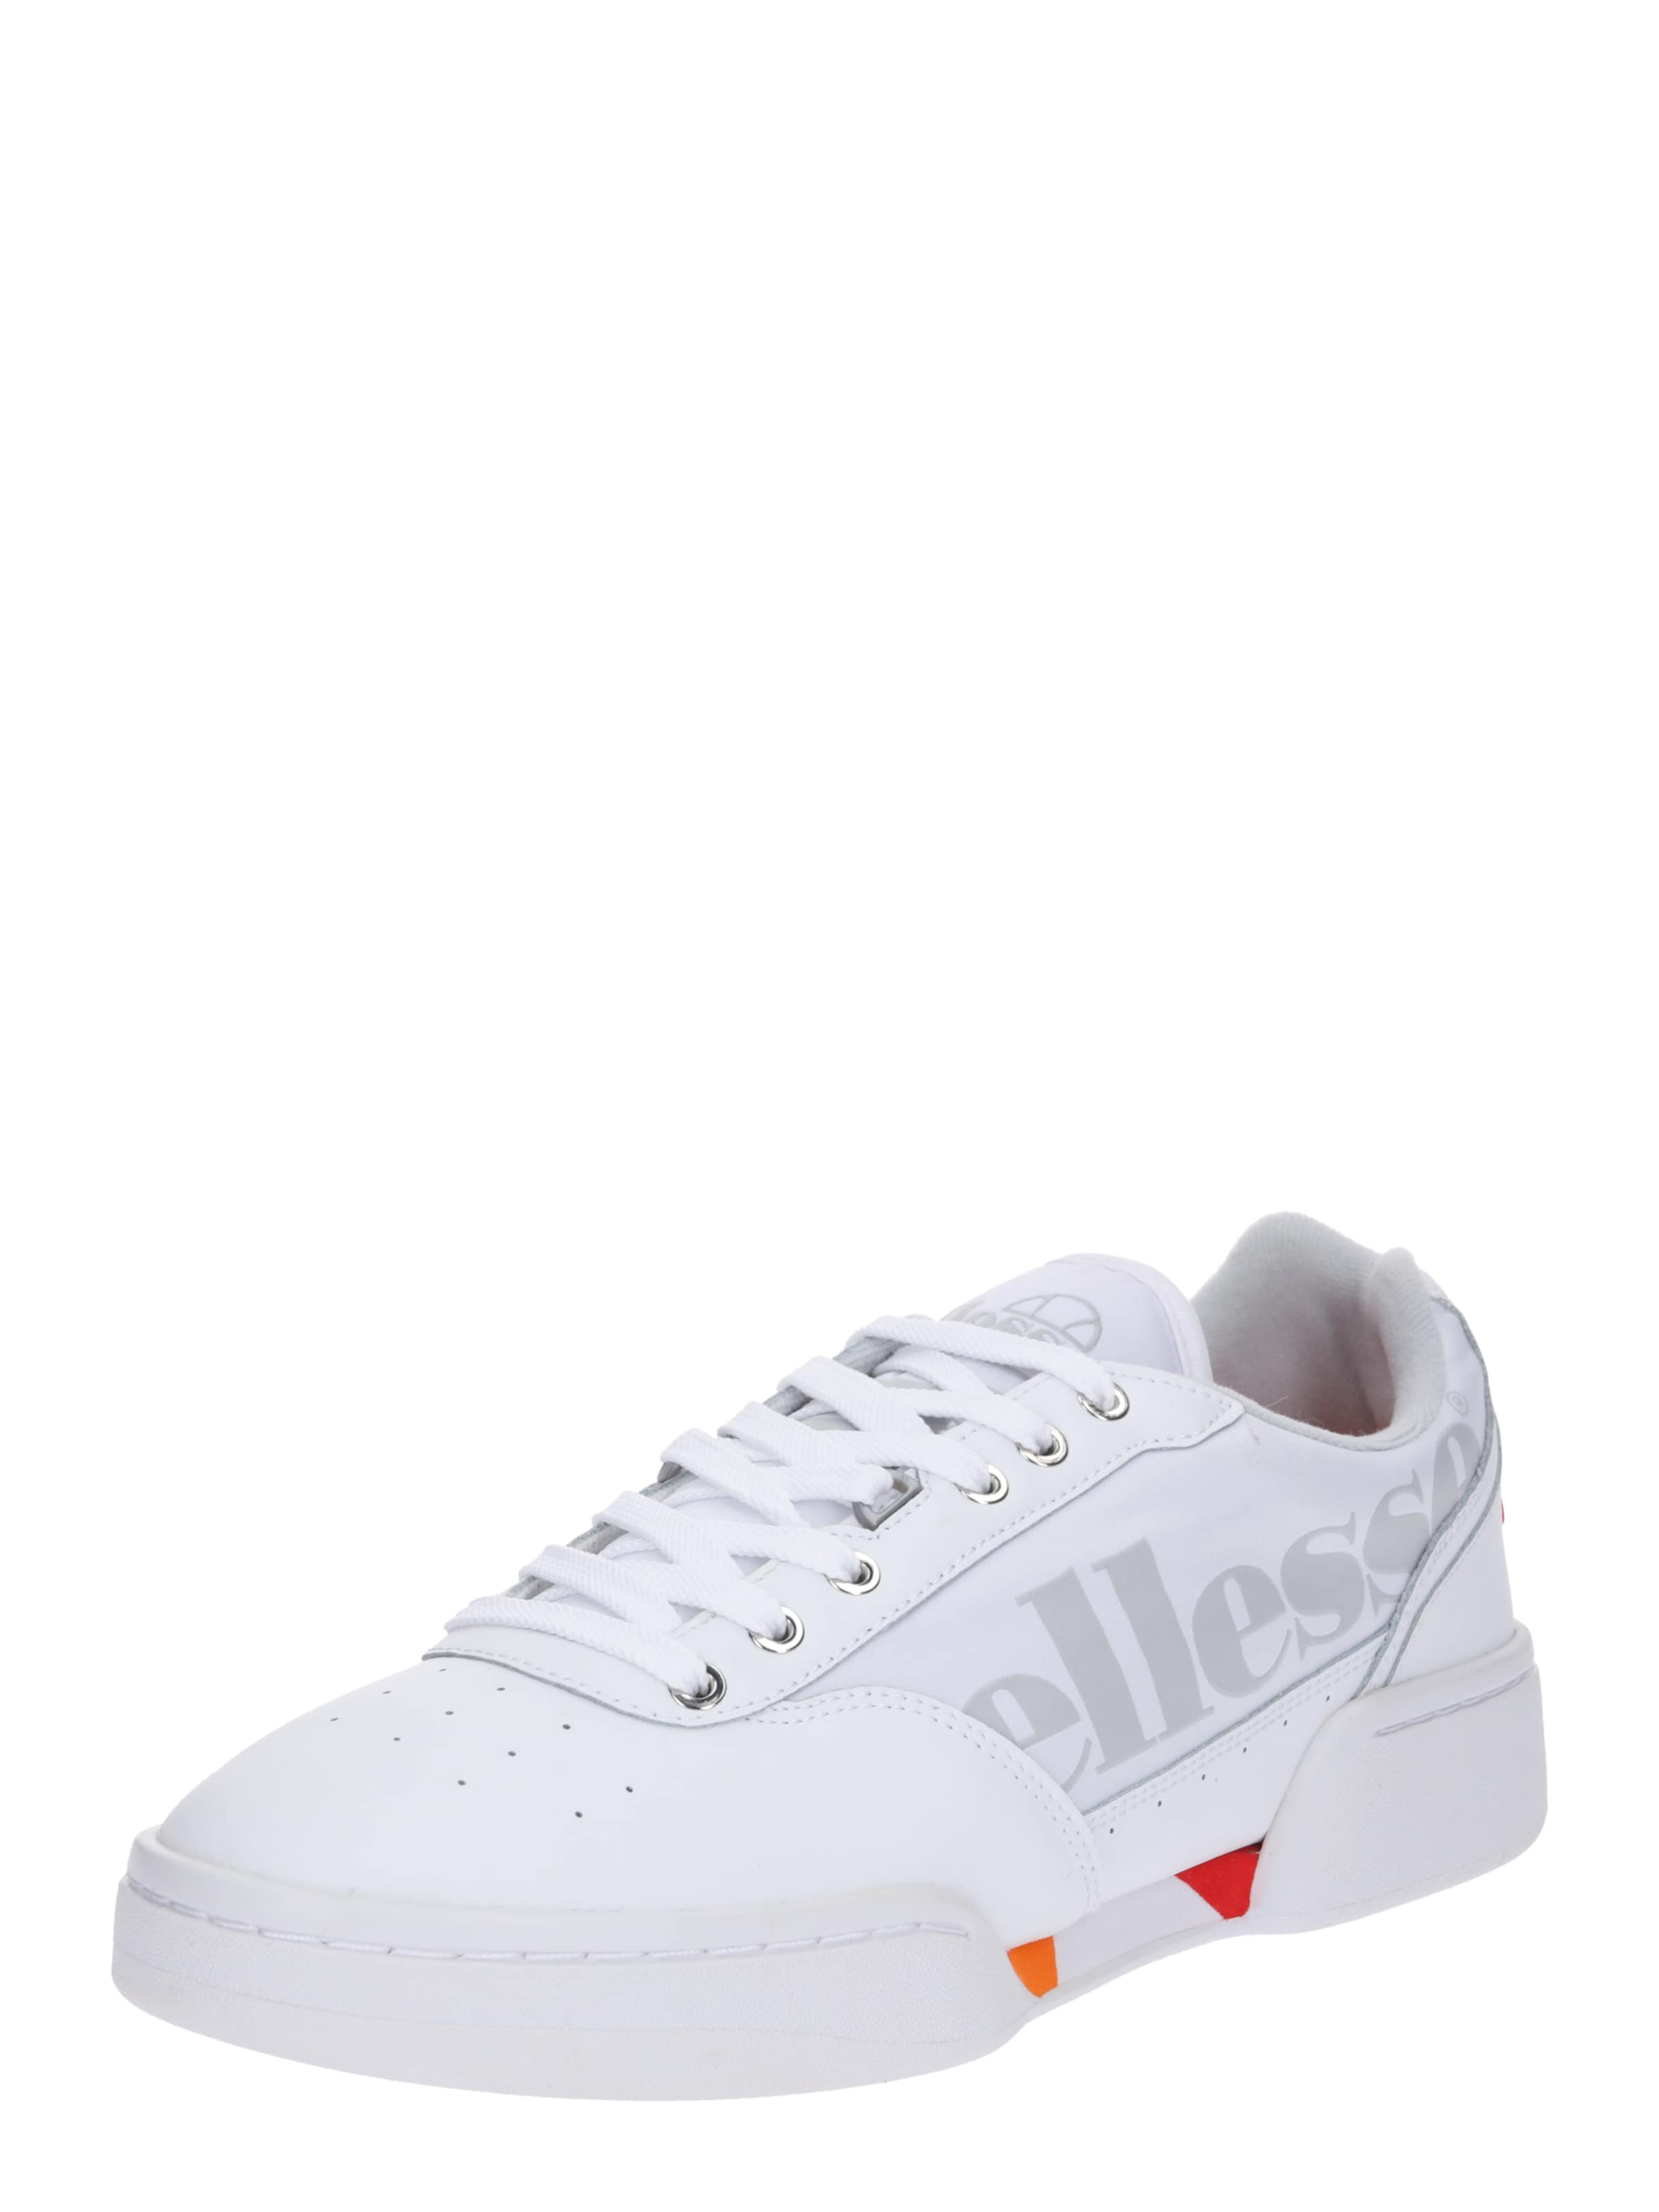 Basses 'piacentino' EllesseBaskets Blanc Basses Blanc In EllesseBaskets In Basses EllesseBaskets 'piacentino' 8wO0ZPNnkX